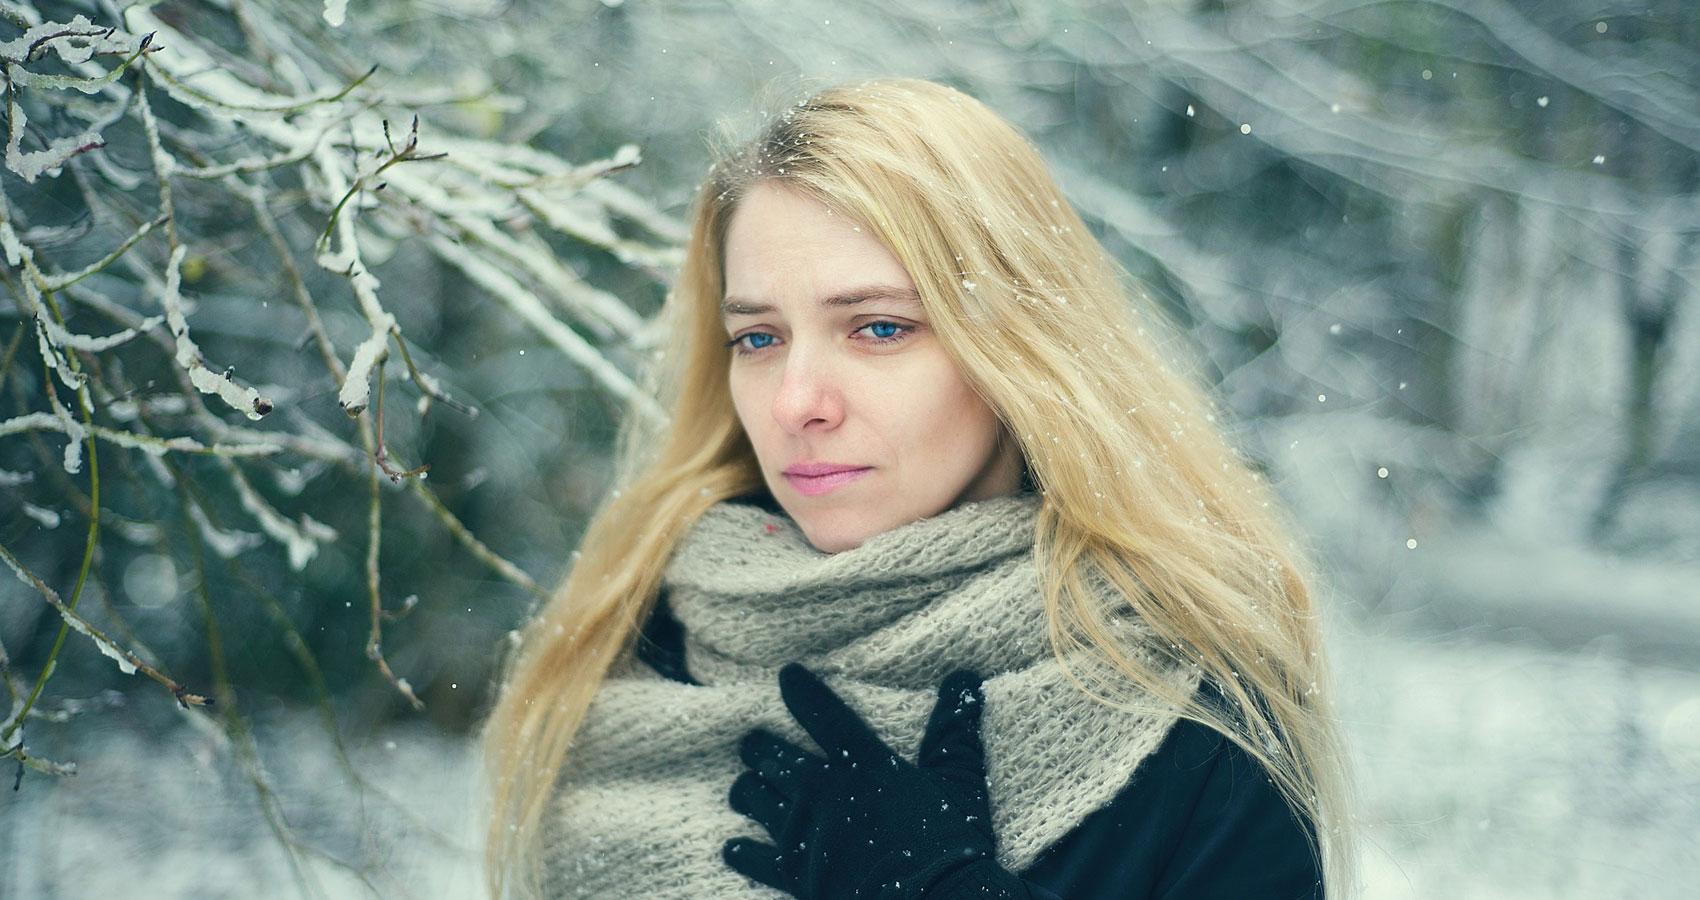 I Touched The Snow by Magdalena Podobińska at Spillwords.com